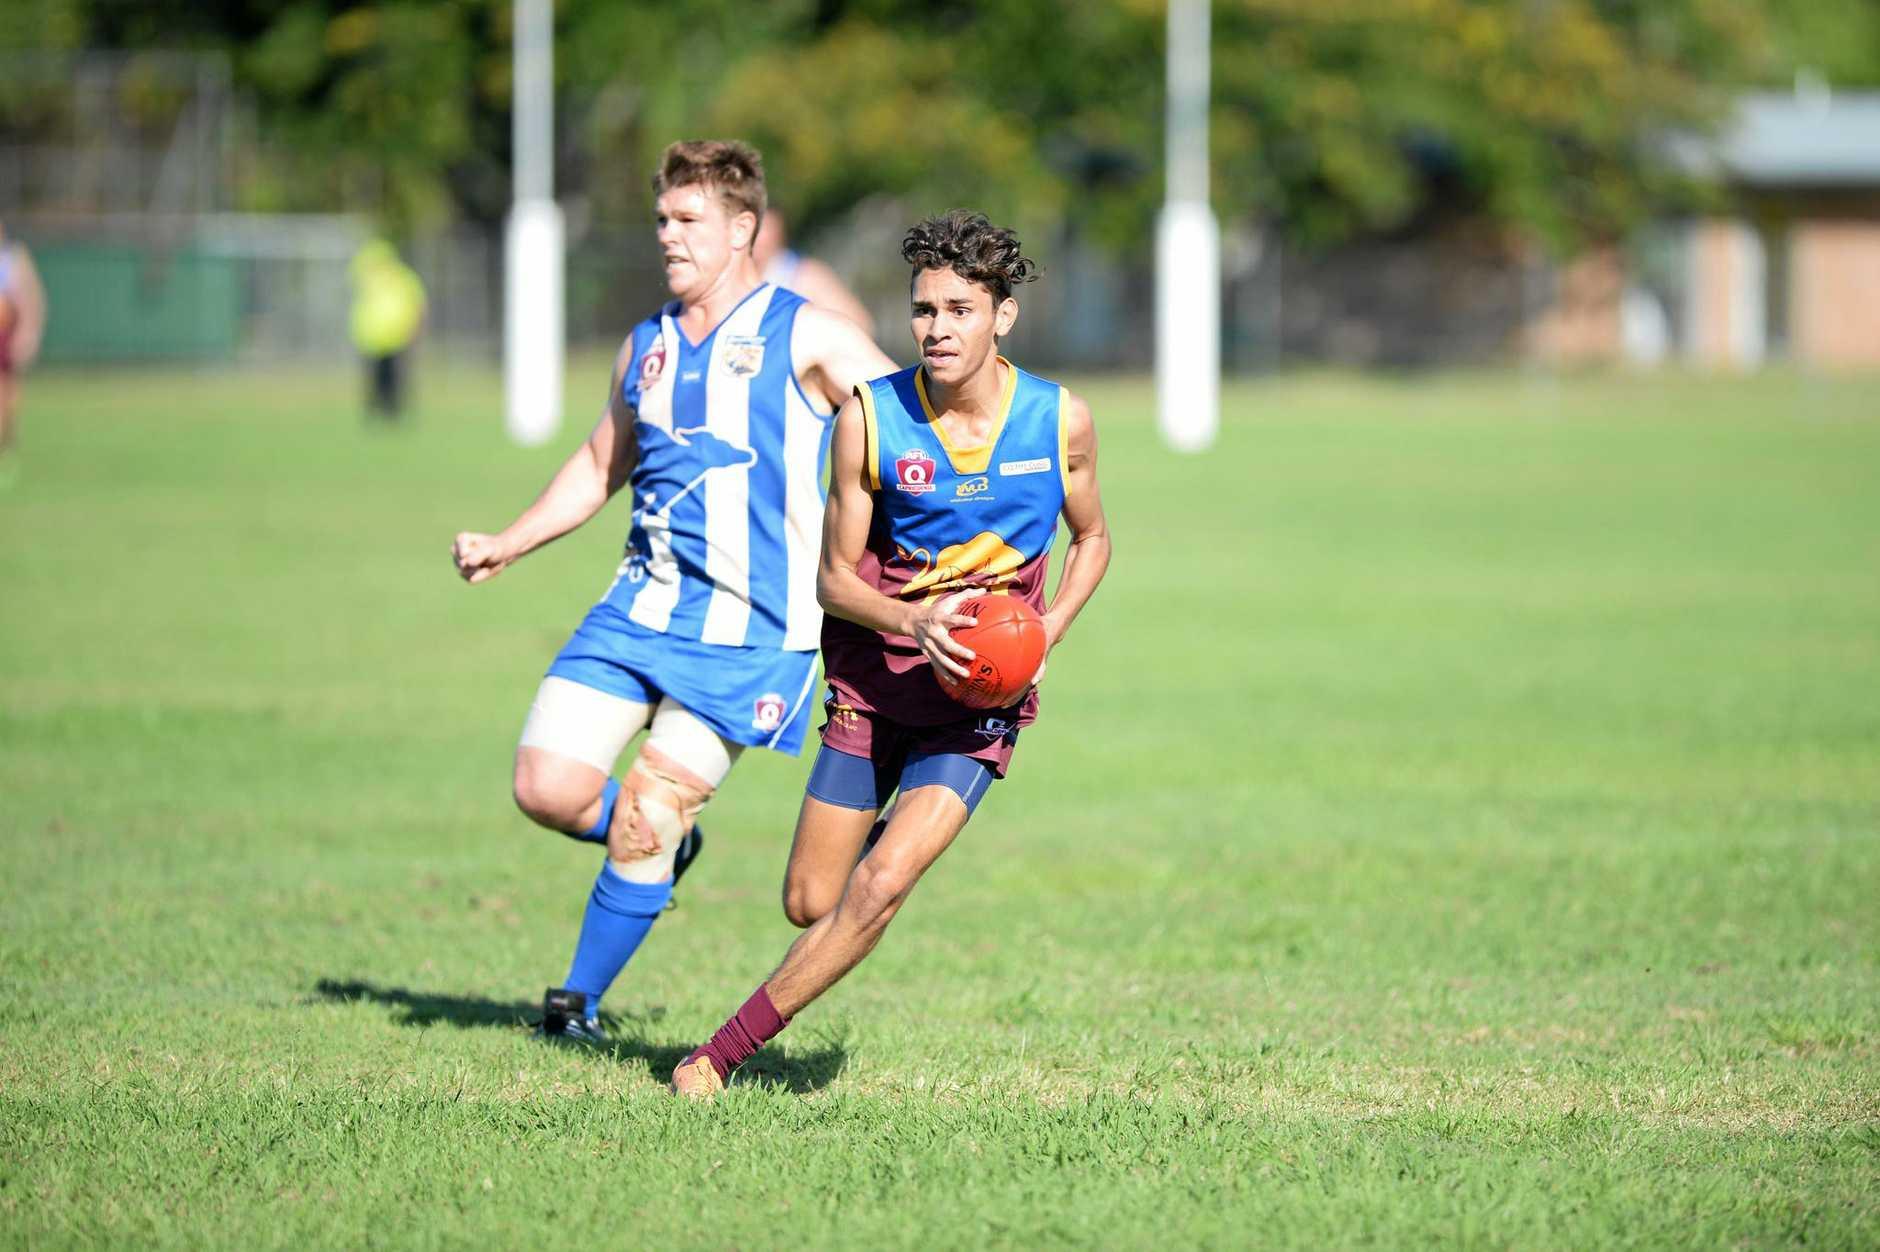 AFL: Glenmore's Joshua Ketchup